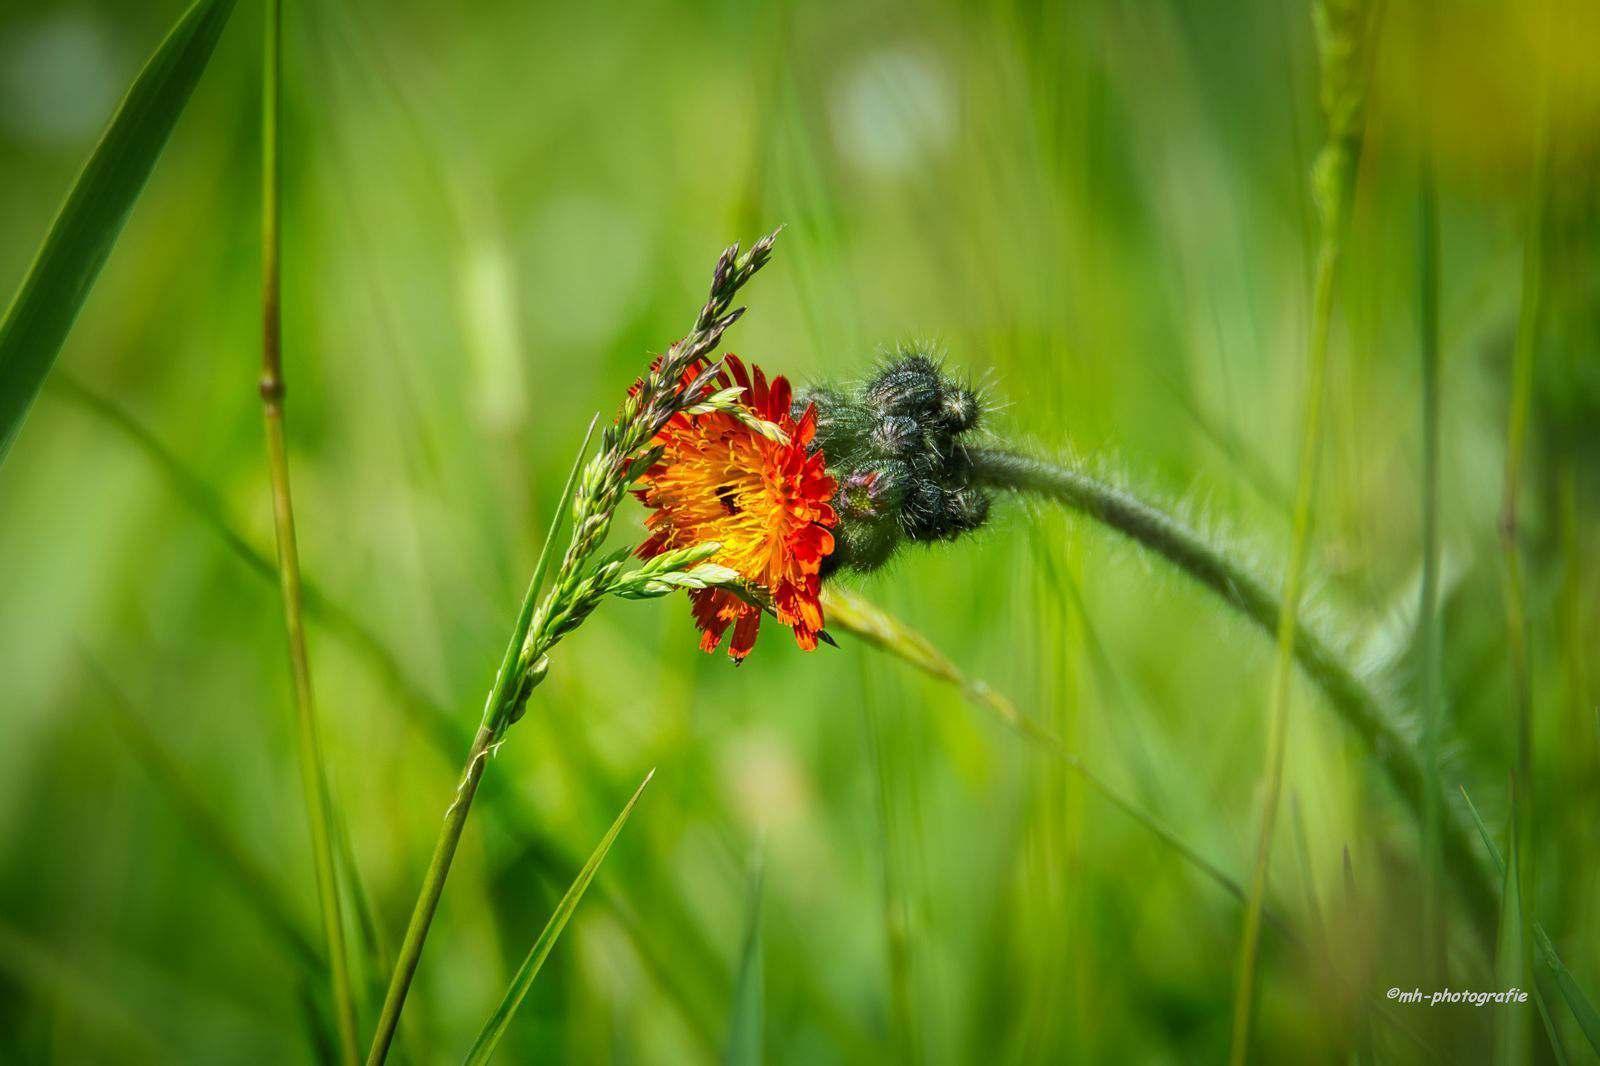 Blumen-DSC_4954-mh-photografie